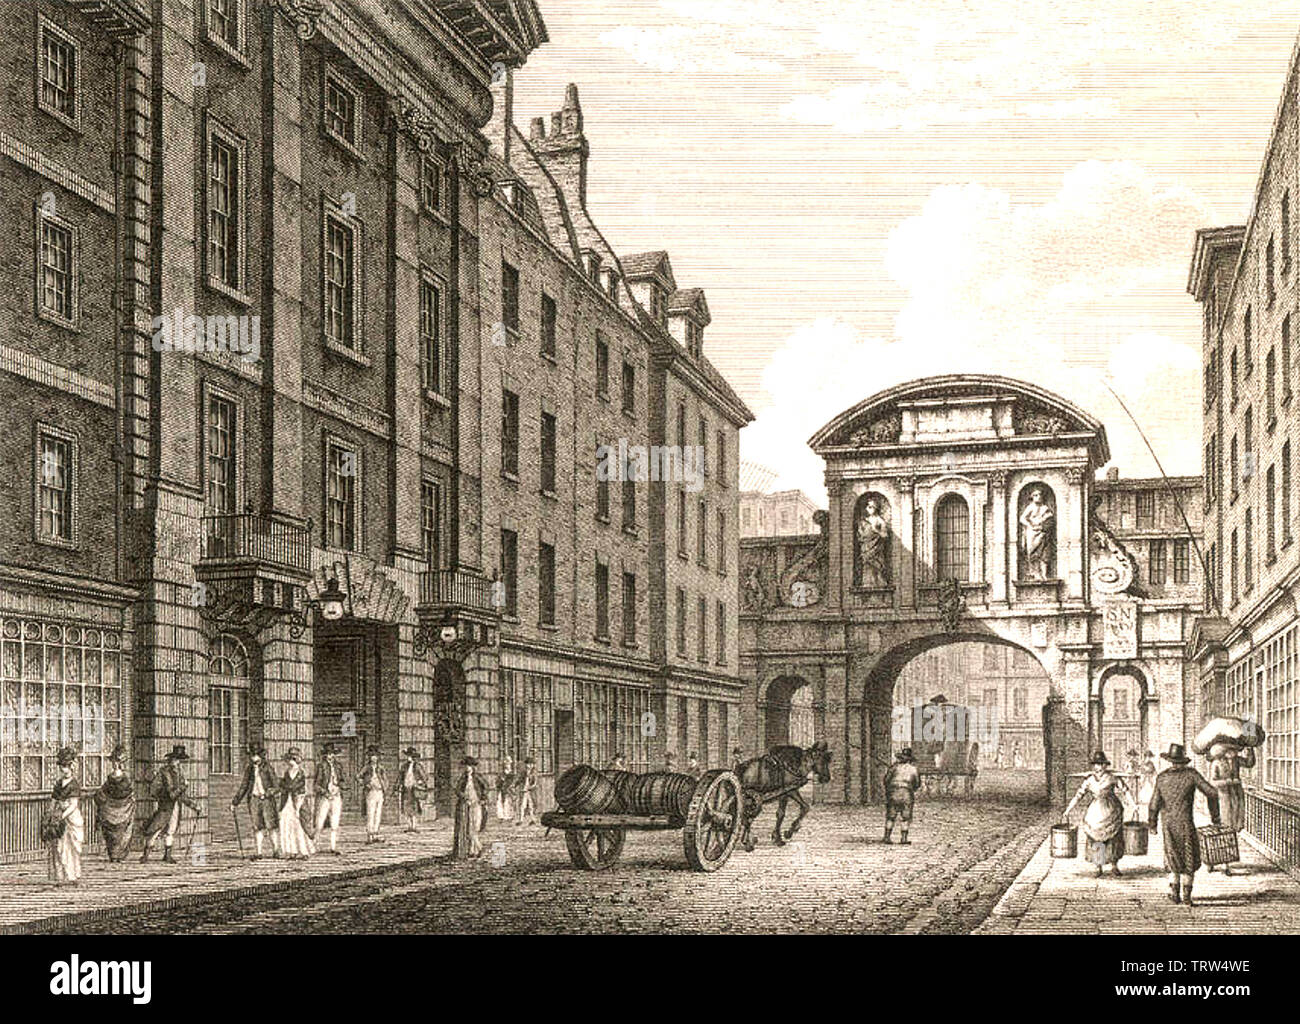 TEMPLE BAR in London's Strand in 1800 - Stock Image